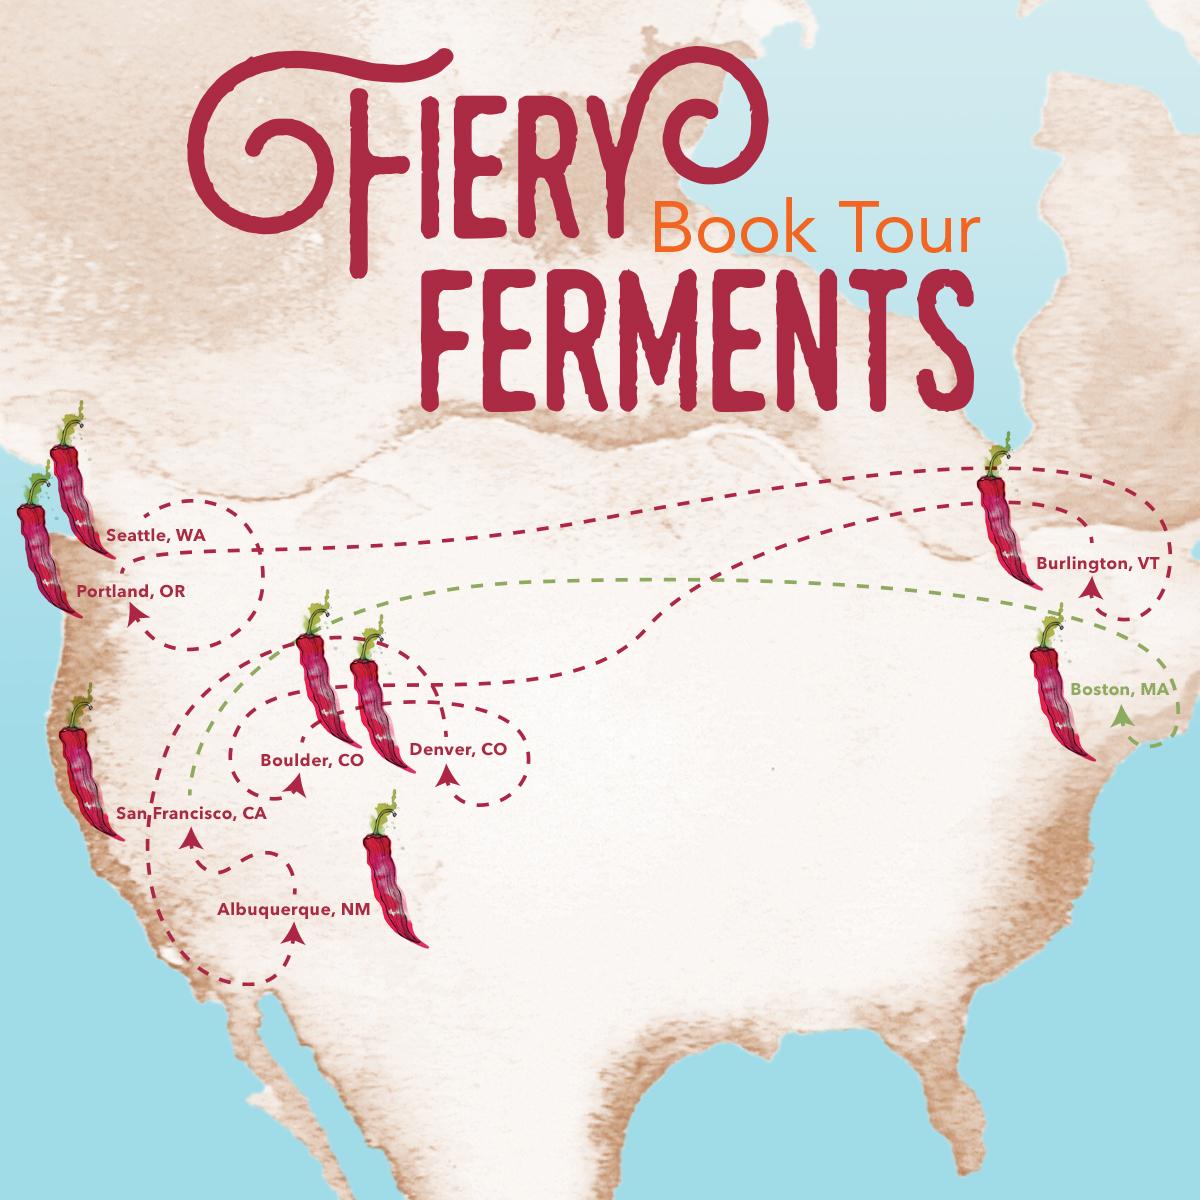 FieryFerments-Tour-Boston.jpg